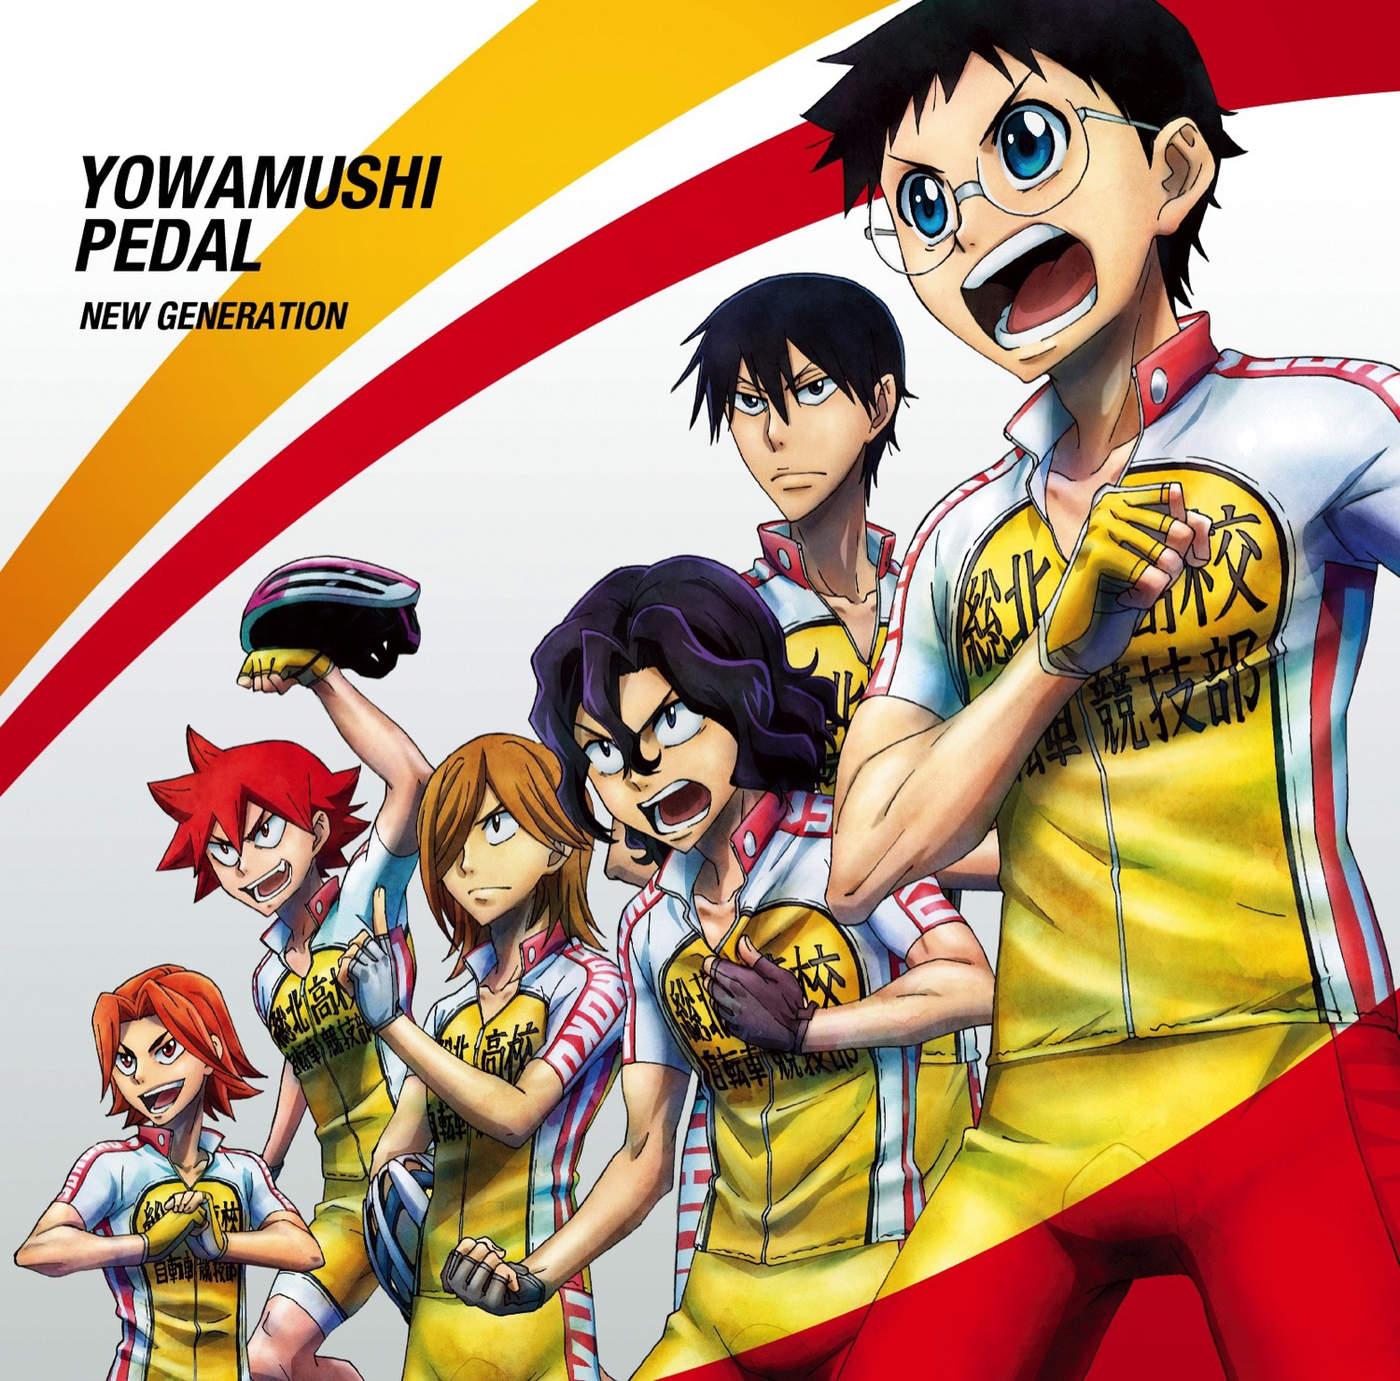 Yowamushi pedal new generation opening 2 full for New generation